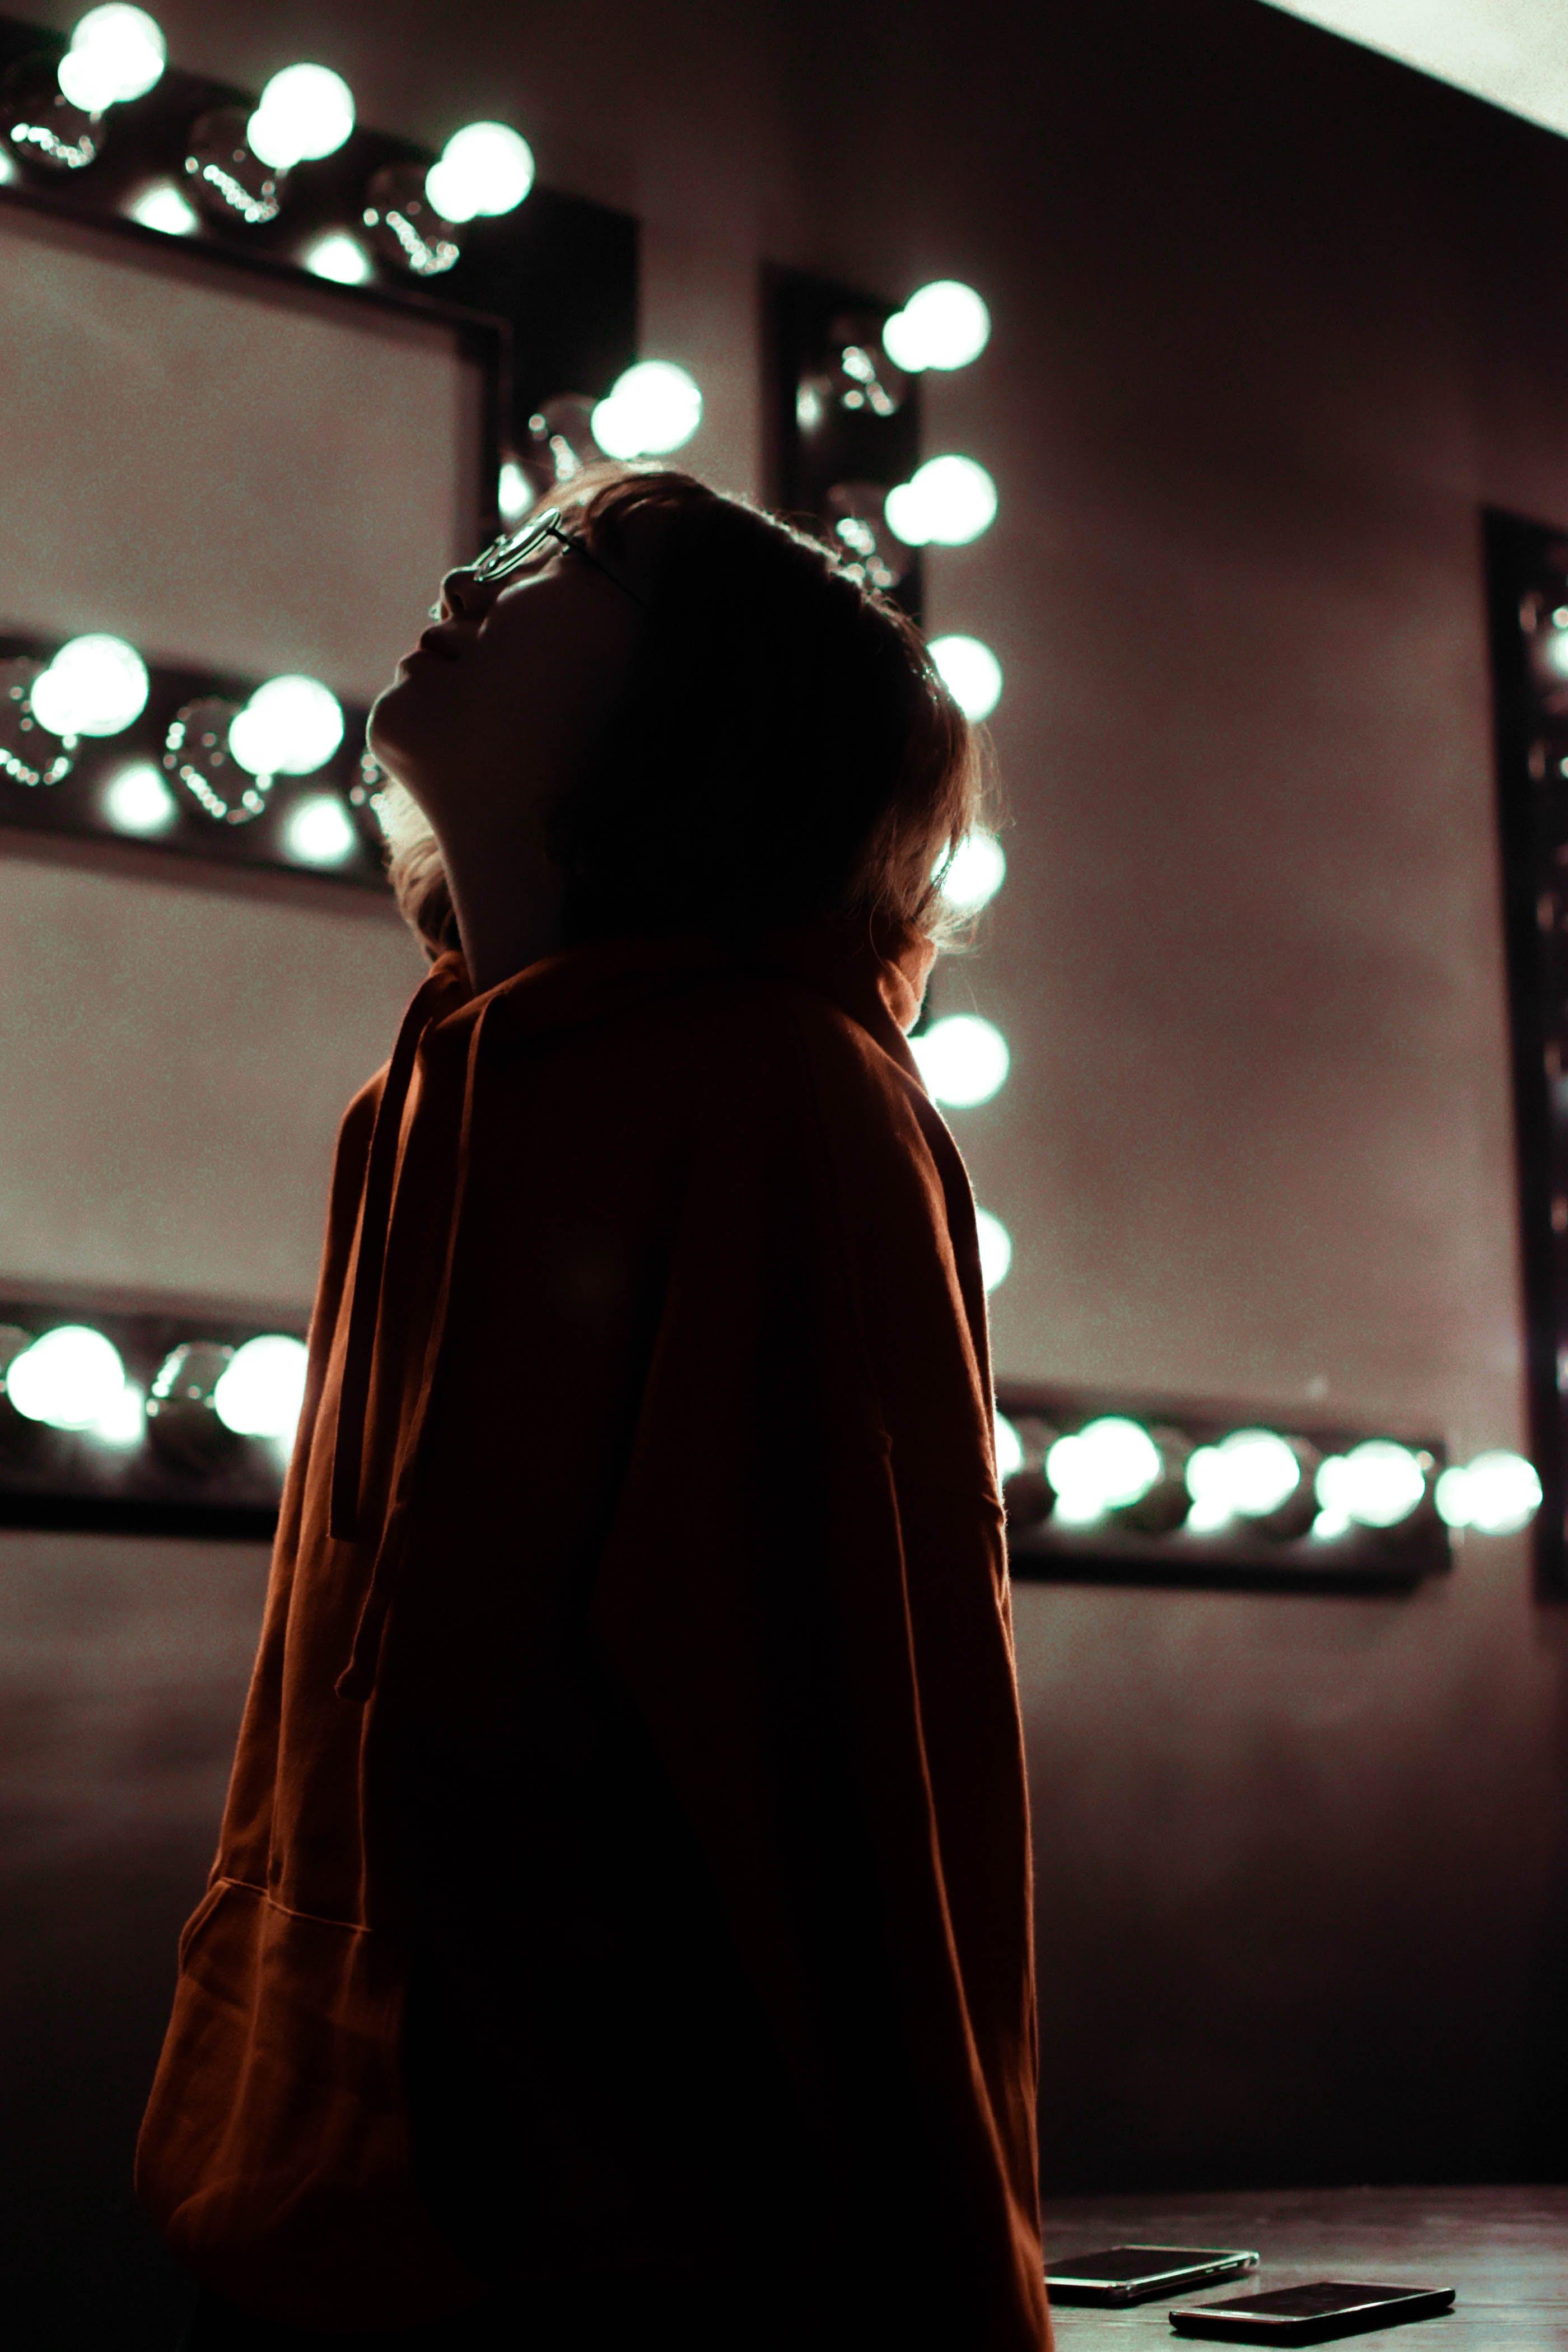 Woman Standing Near Turned-On Light Bulbs